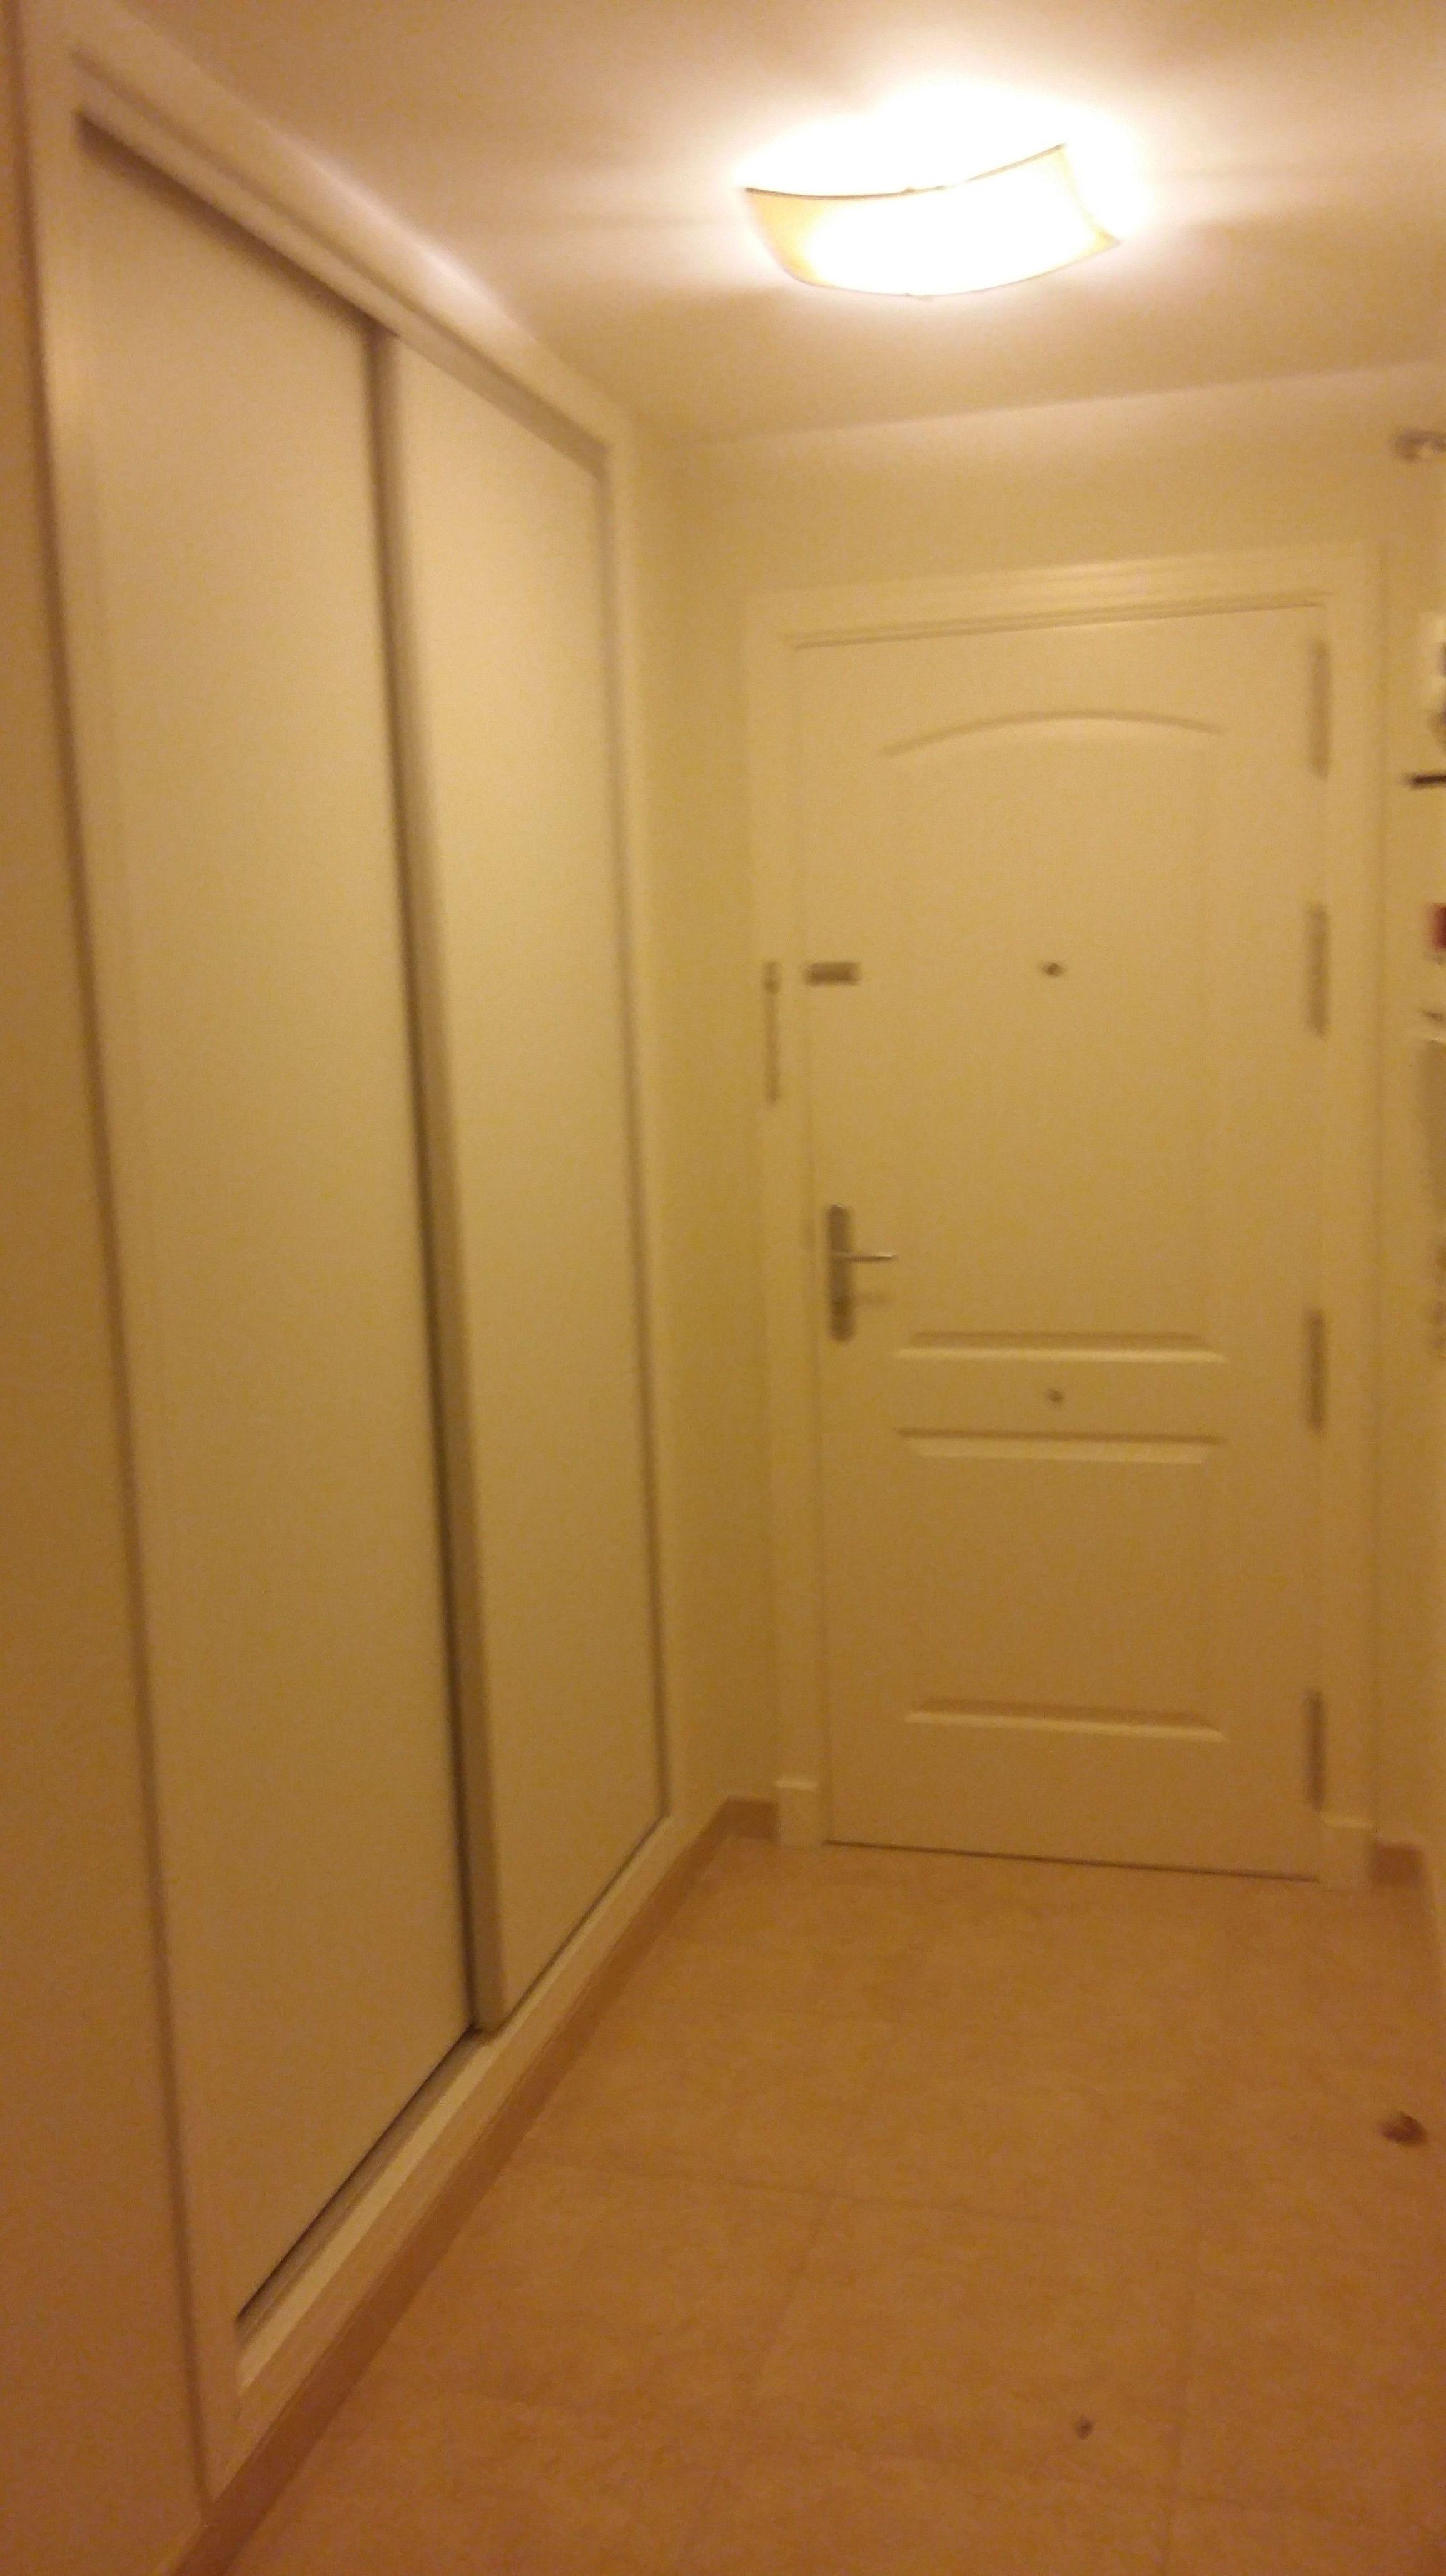 Piso en alquiler en aguadulce almeria - Alquiler de pisos baratos en majadahonda ...